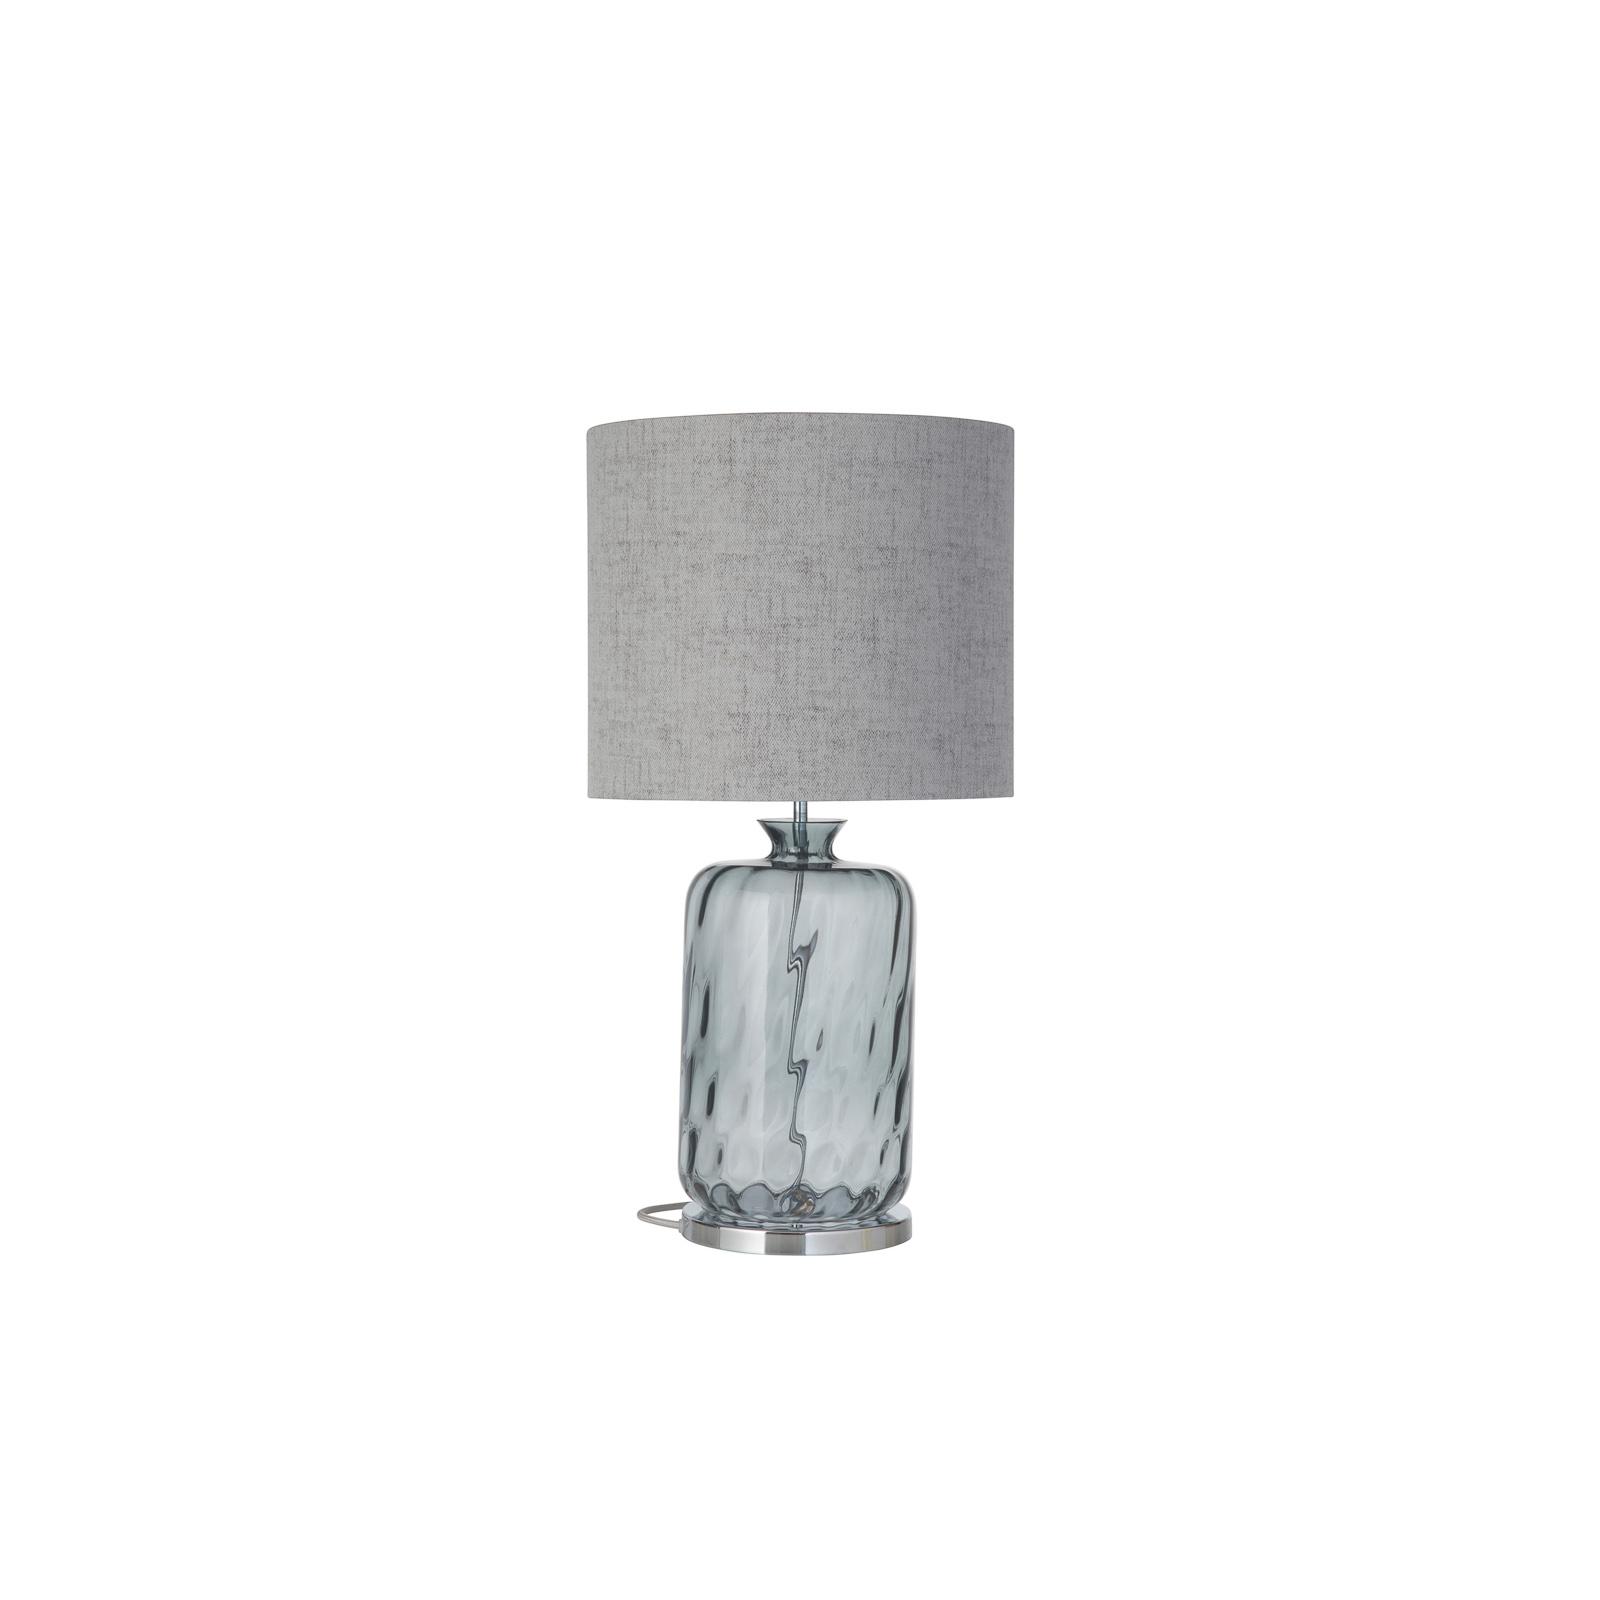 EBB & FLOW Pillar Marl bordlampe, grå/røggrå